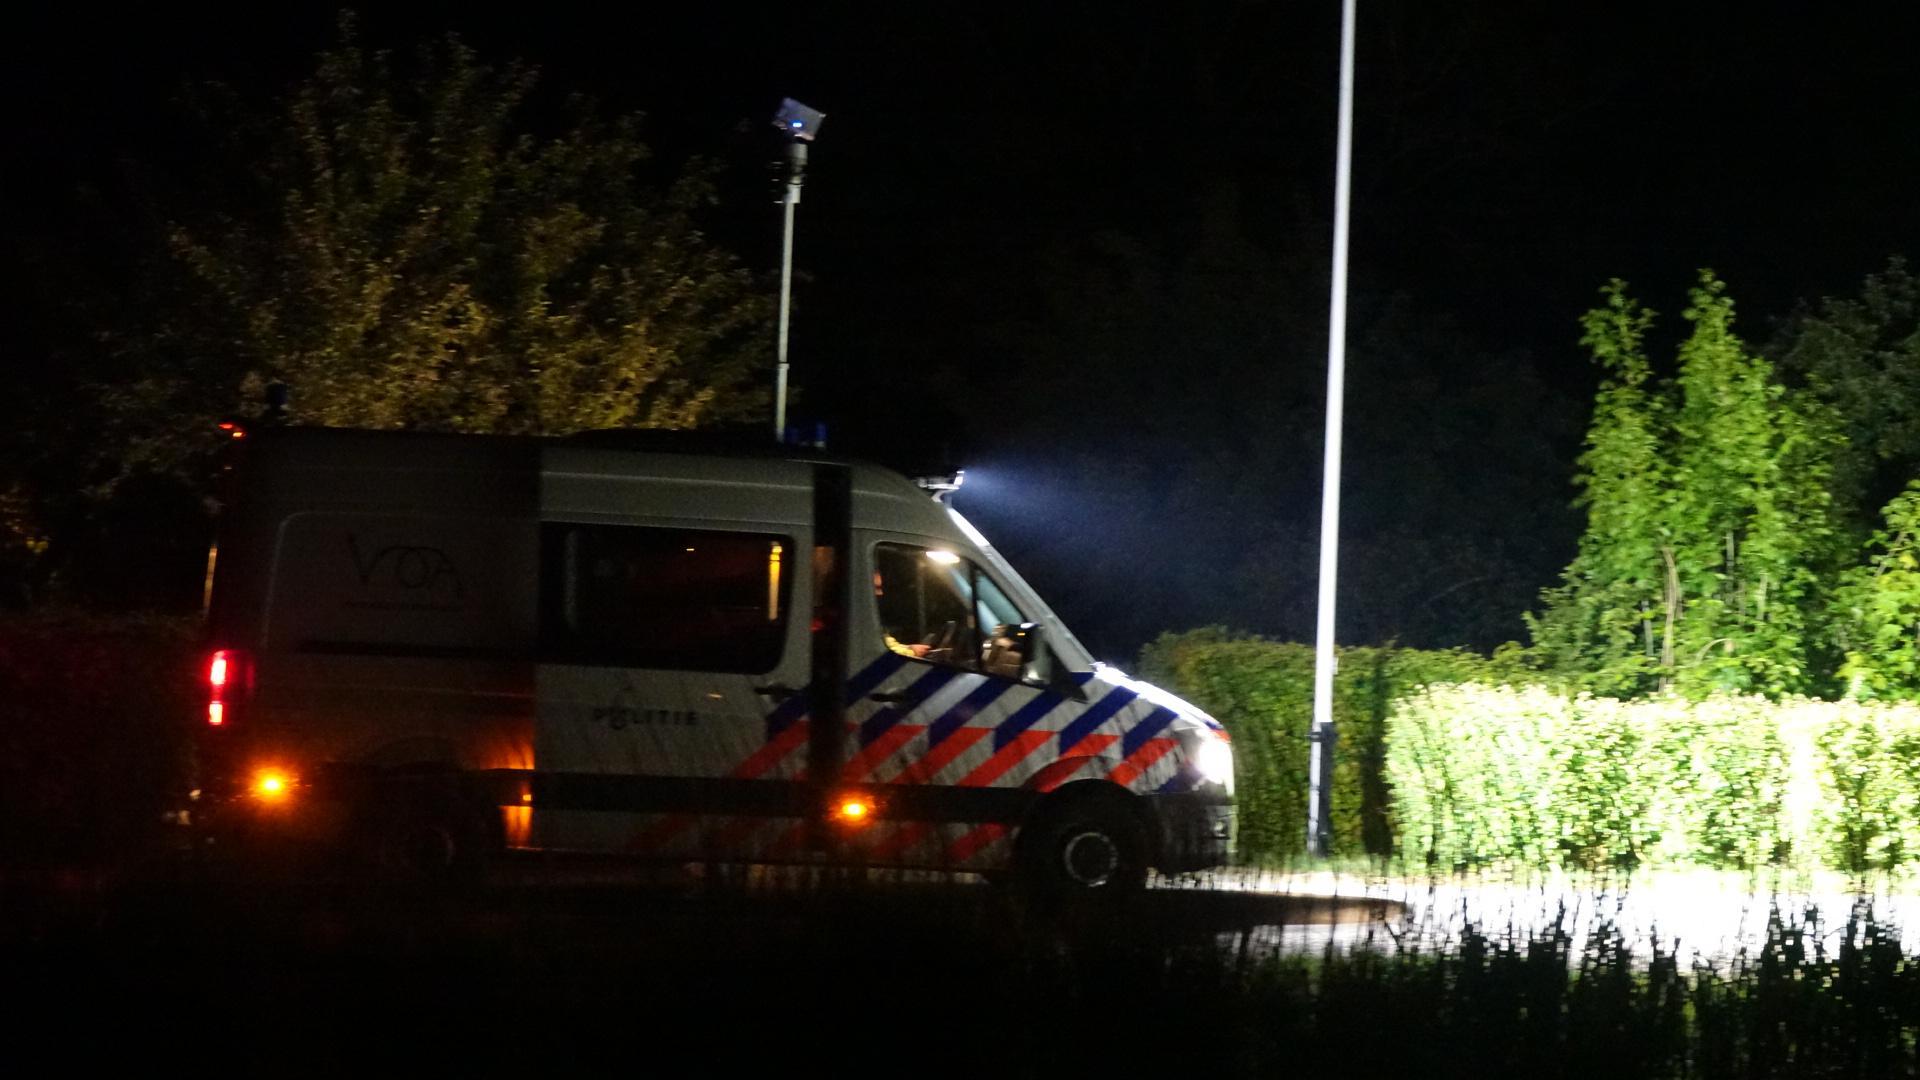 Man overleden na aanrijding op Groote Sloot, identiteit slachtoffer onbekend [video]